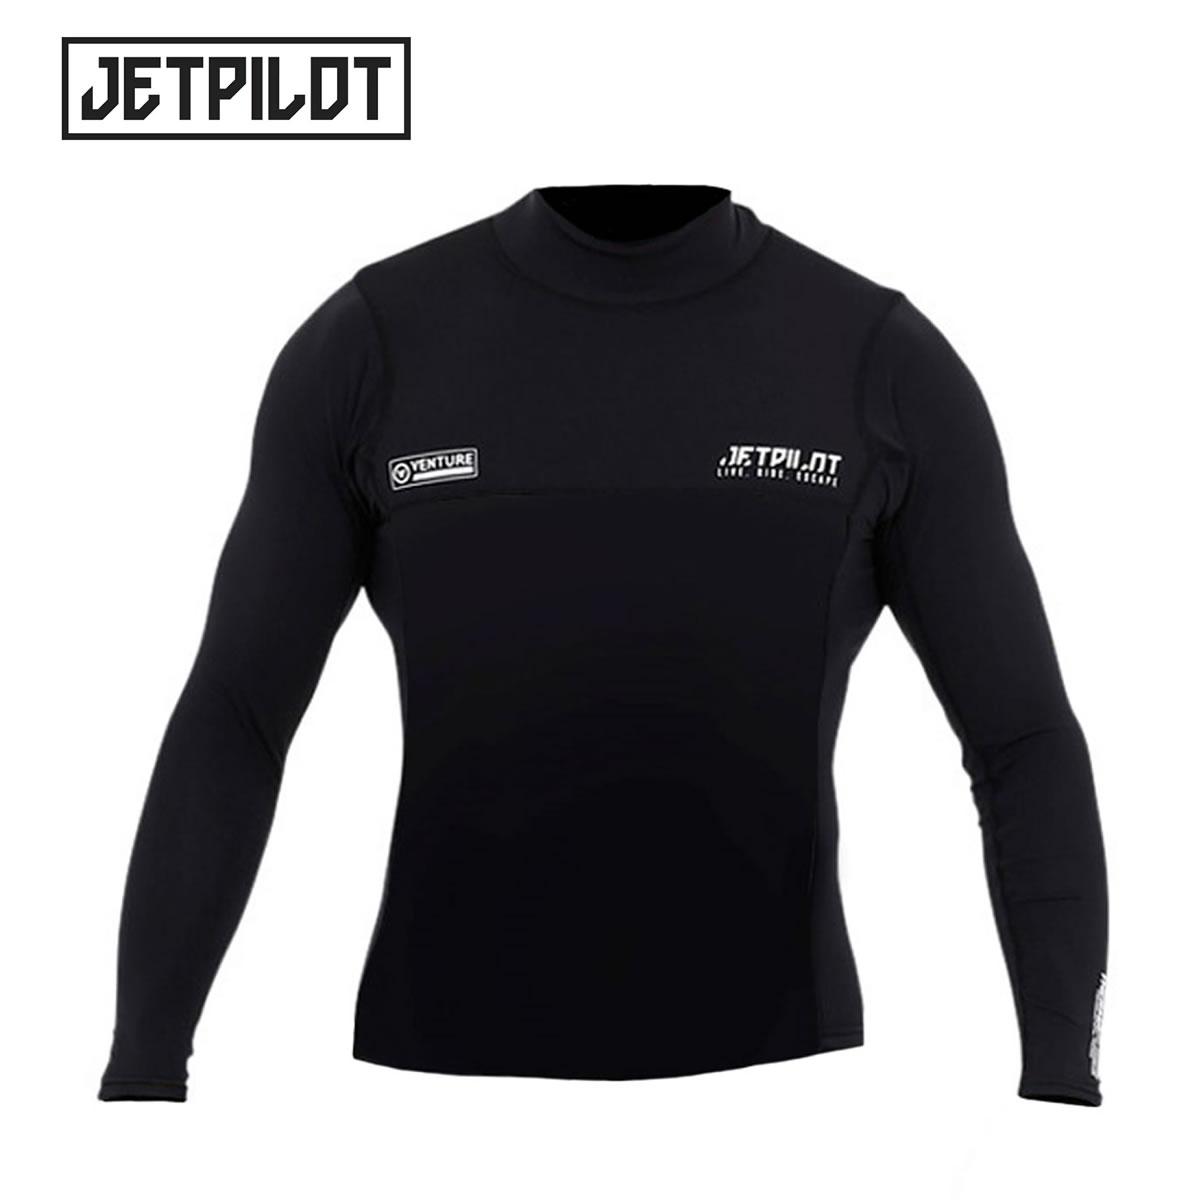 JETPILOT(ジェットパイロット) 長袖サーマフリースラッシュガード VENTURE(JA20159) レターパックライト対応